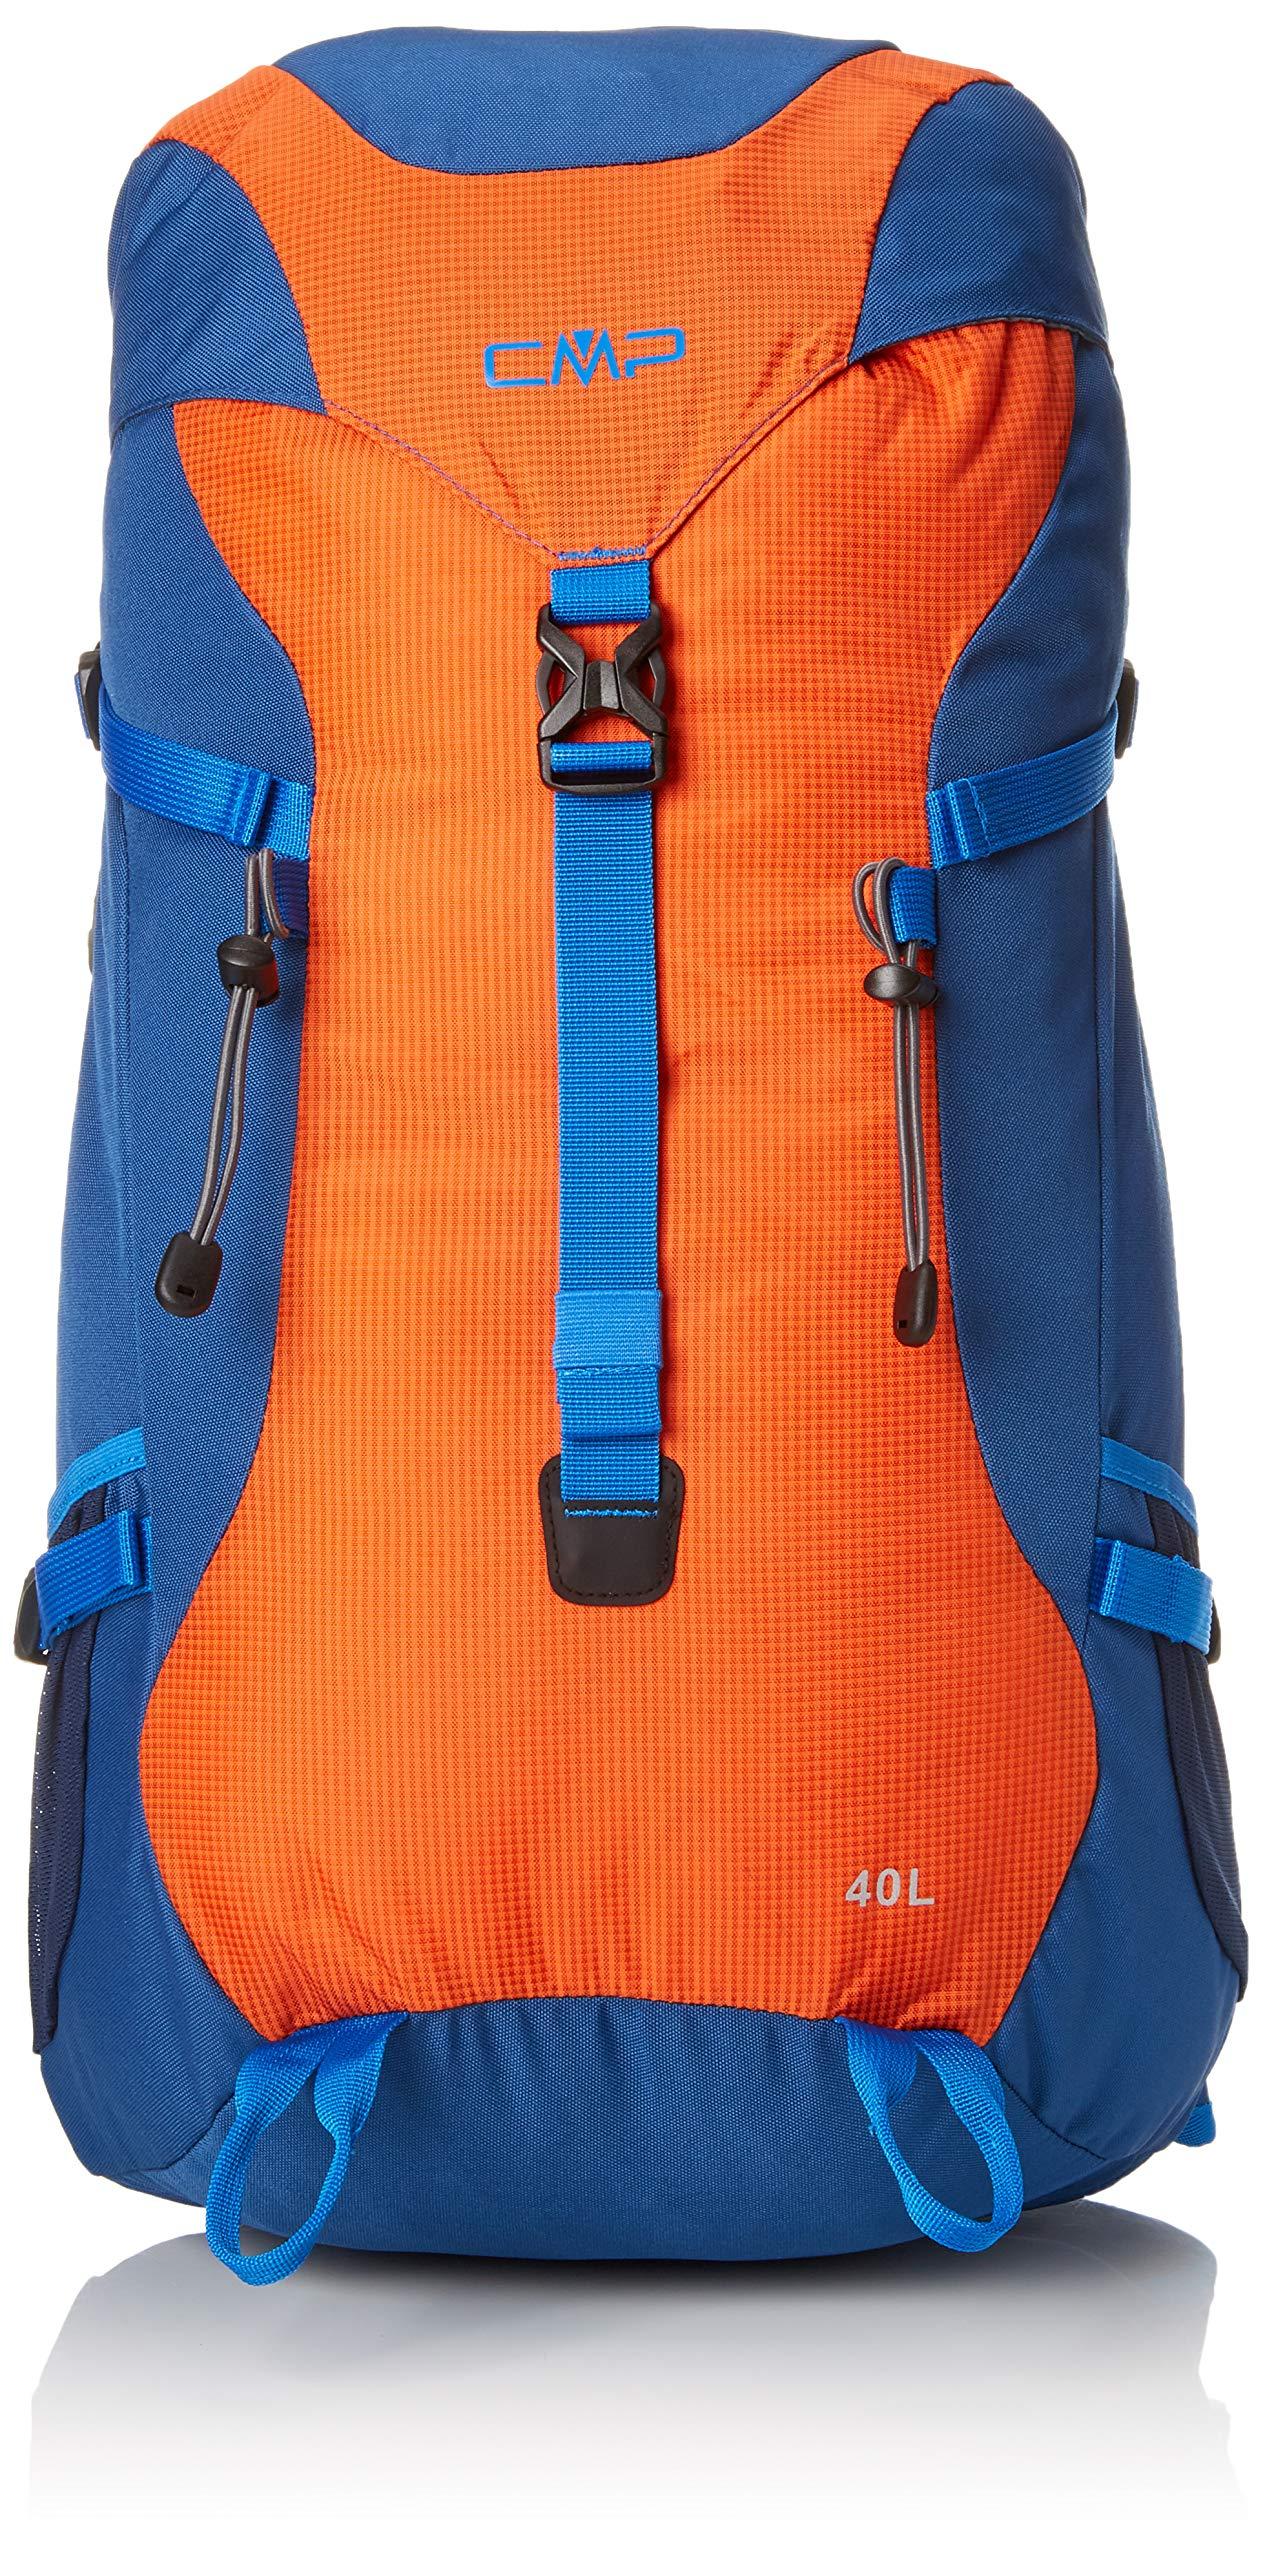 CMP Unisex Adult Caponord Backpack 40L Rucksack, Marine-Orange, U